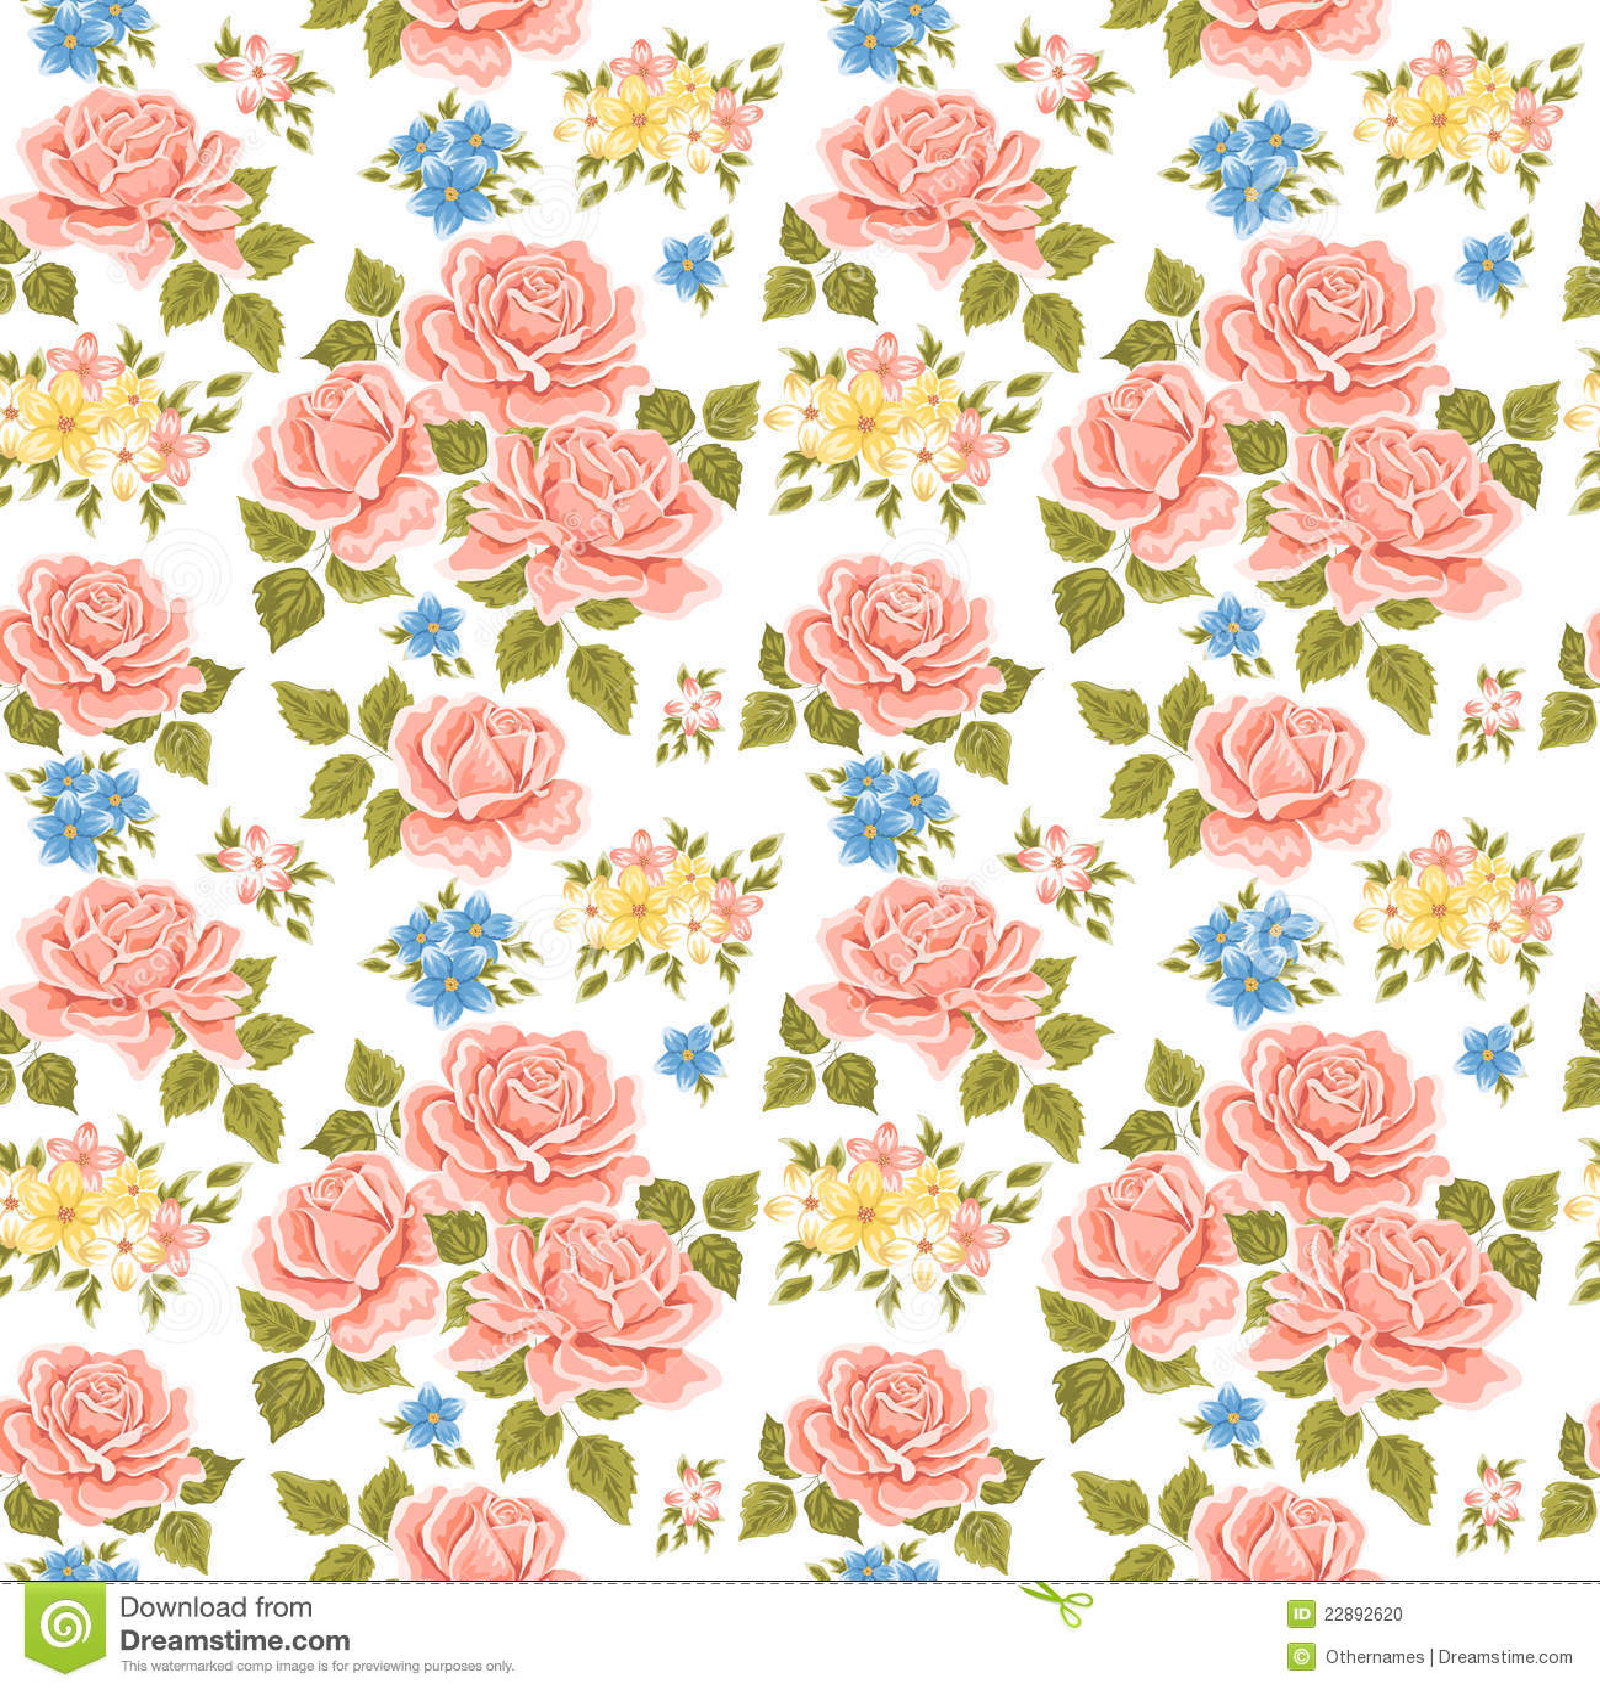 flowery wallpaper background stock photo image 22892620